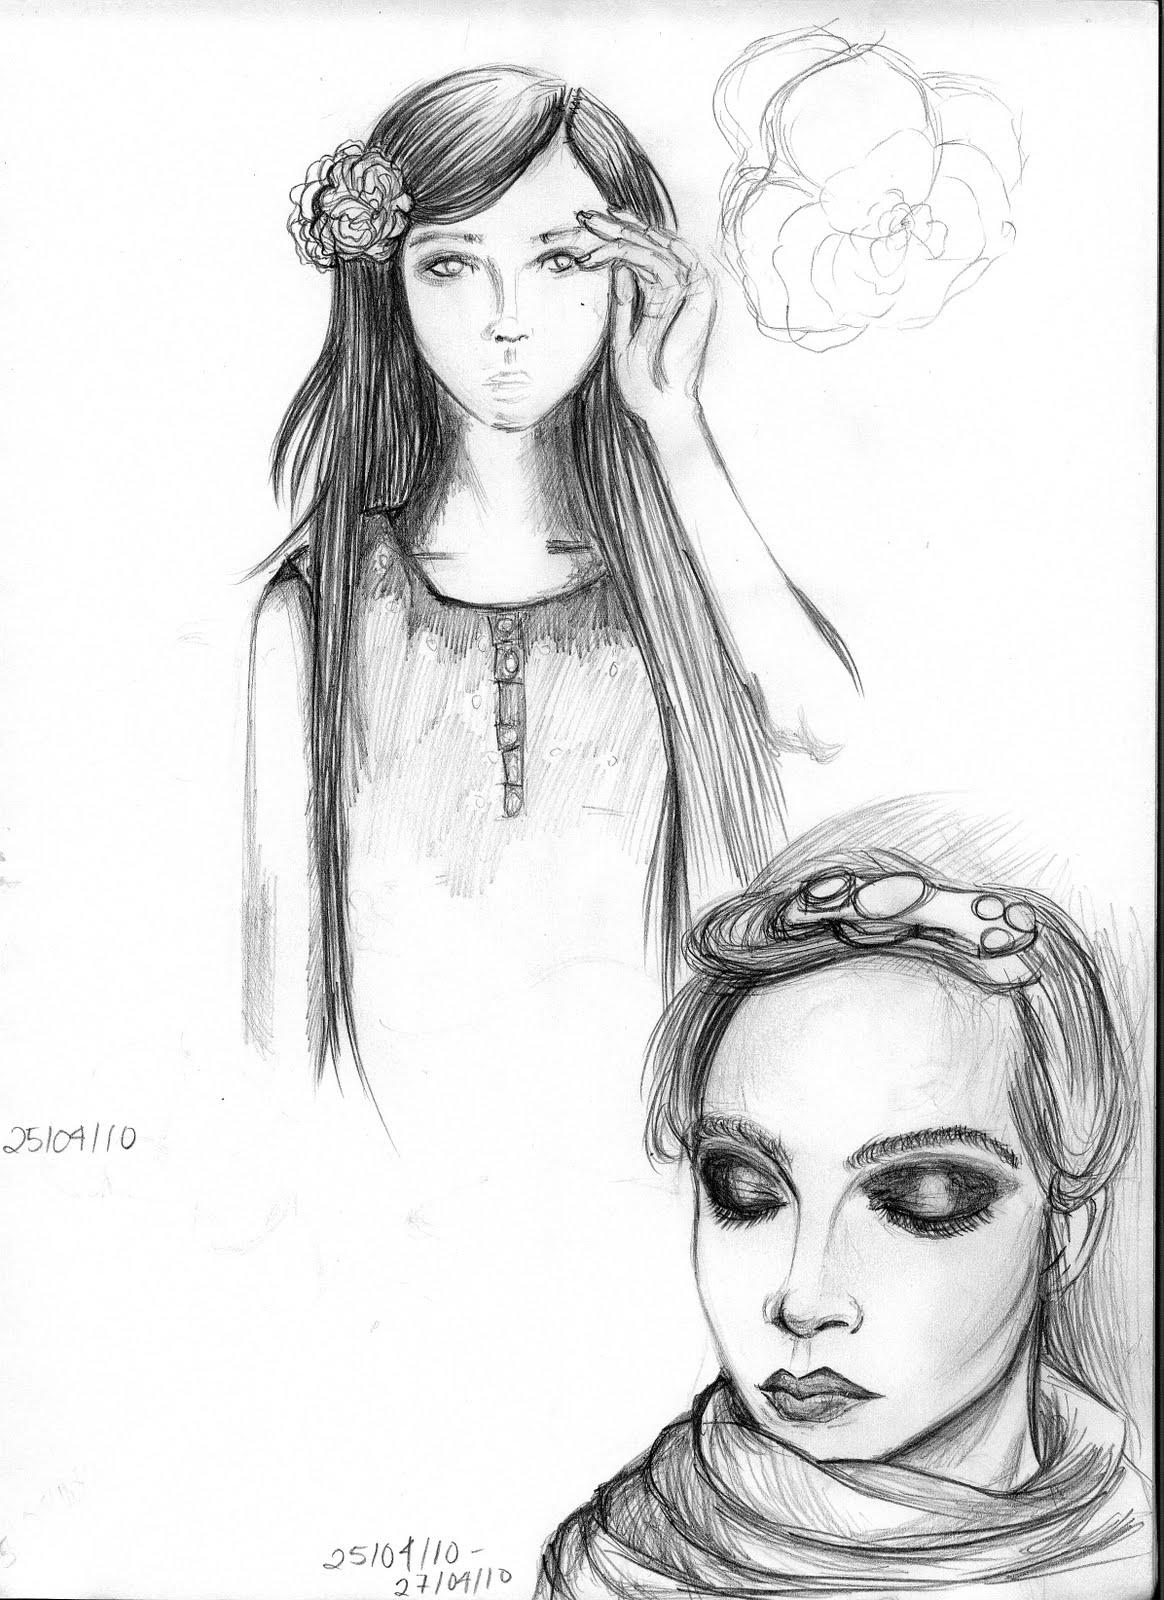 http://1.bp.blogspot.com/_wpqi5zRI1J8/S9iICeeN8JI/AAAAAAAAABE/s0b7wjkZc_4/s1600/sketchbook%2B2010%2B-%2Bmagazine%2Bmodels.jpg